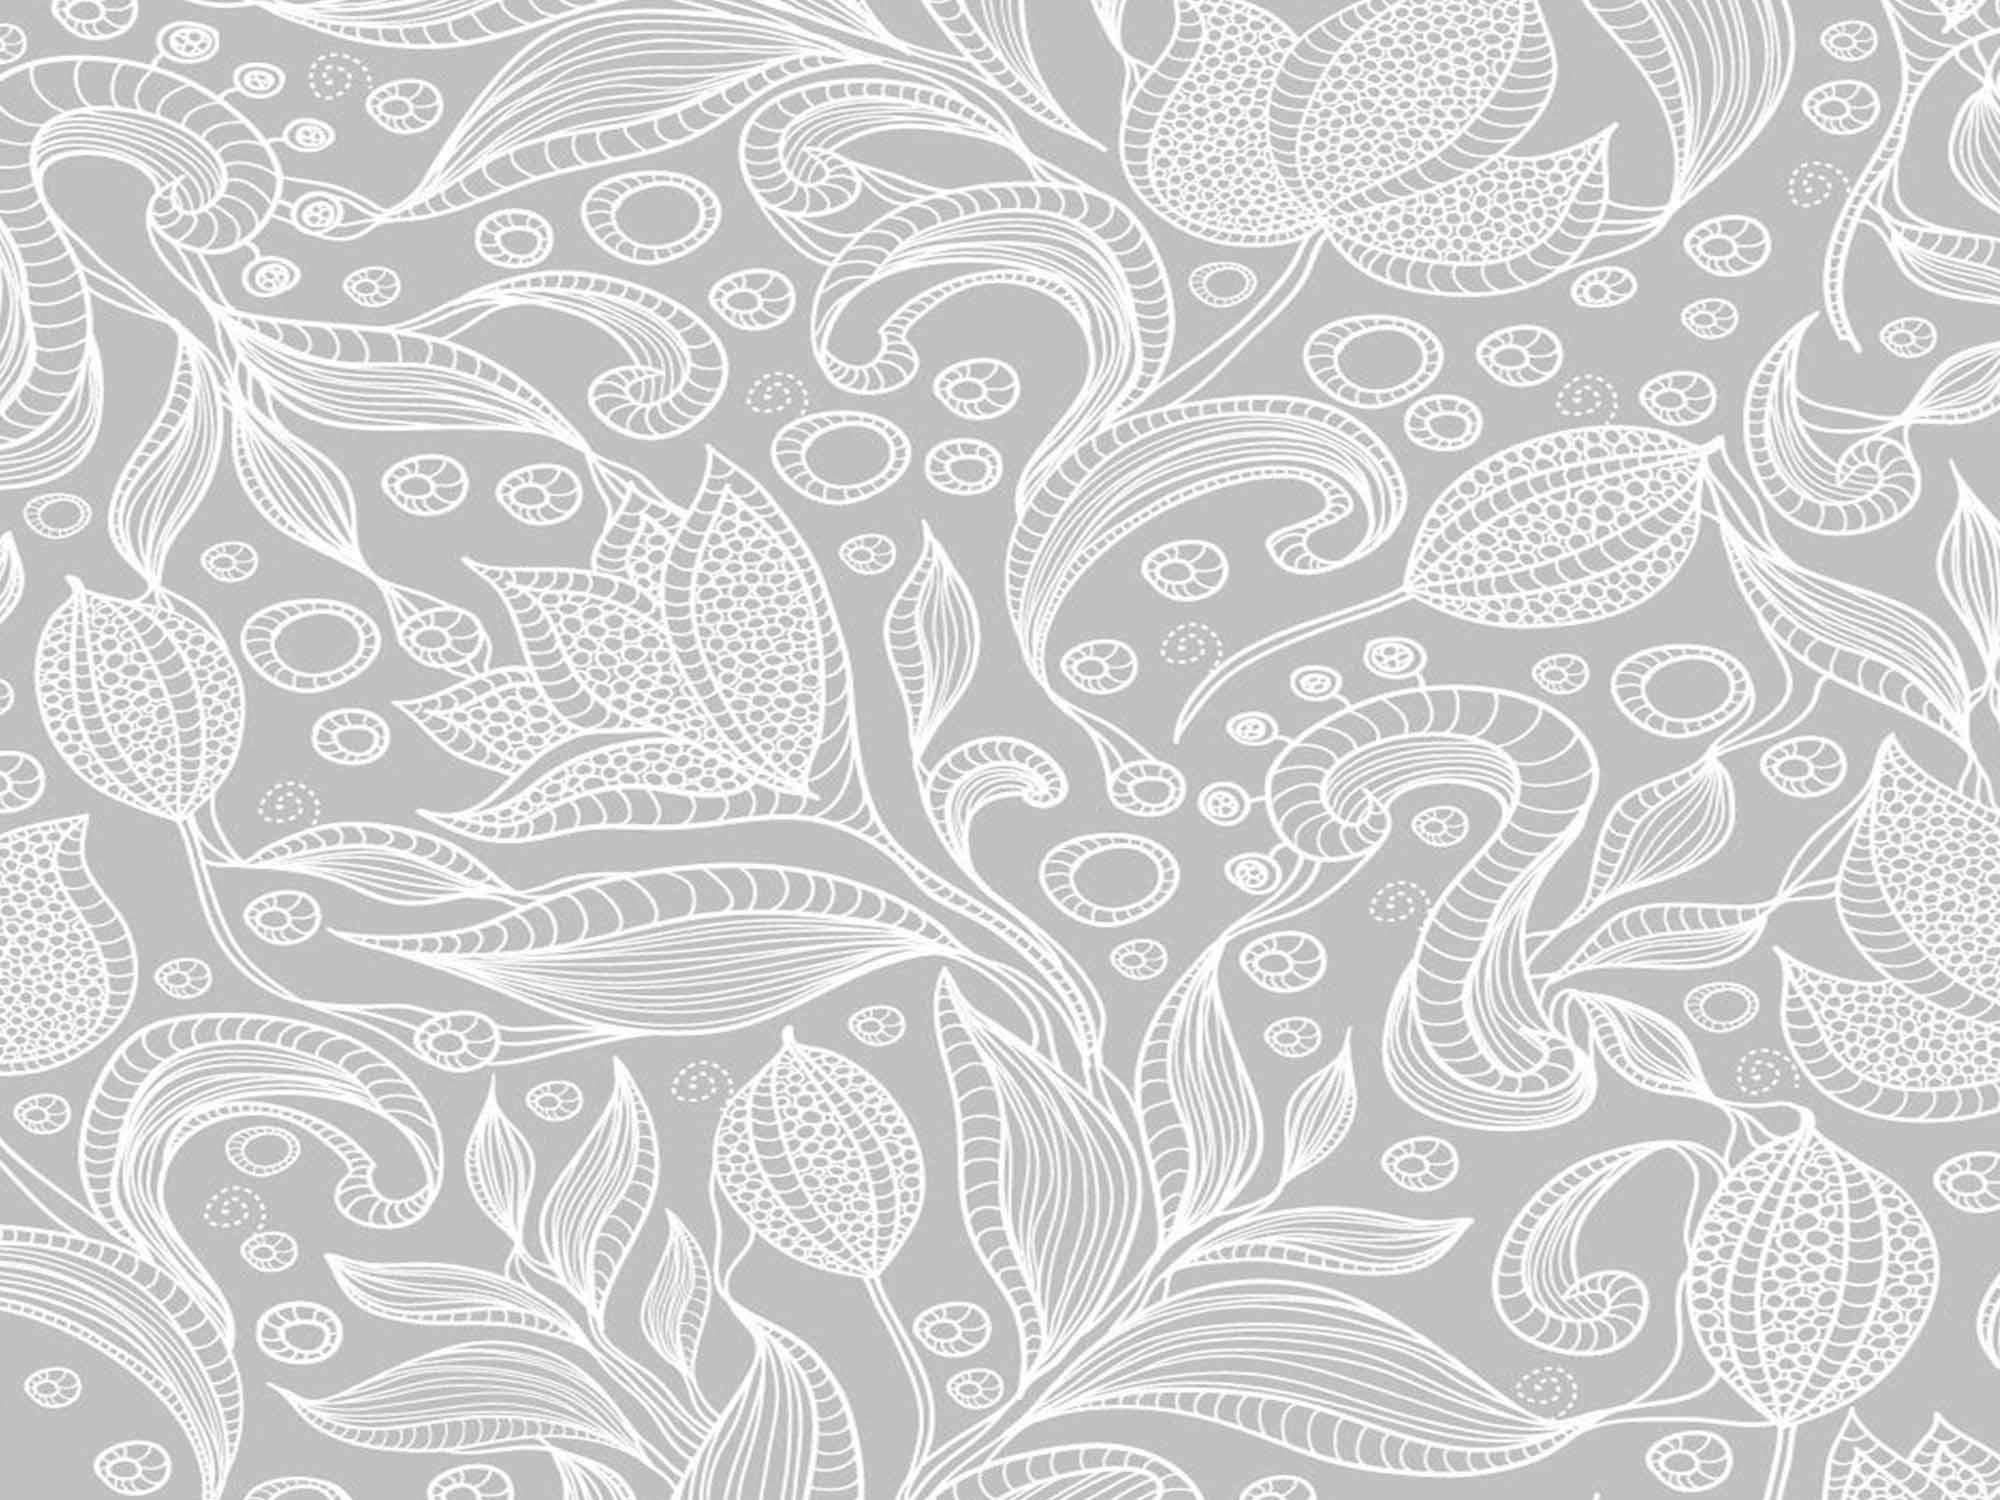 Papel de Parede Floral 0097 - Adesivos de Parede  - Paredes Decoradas